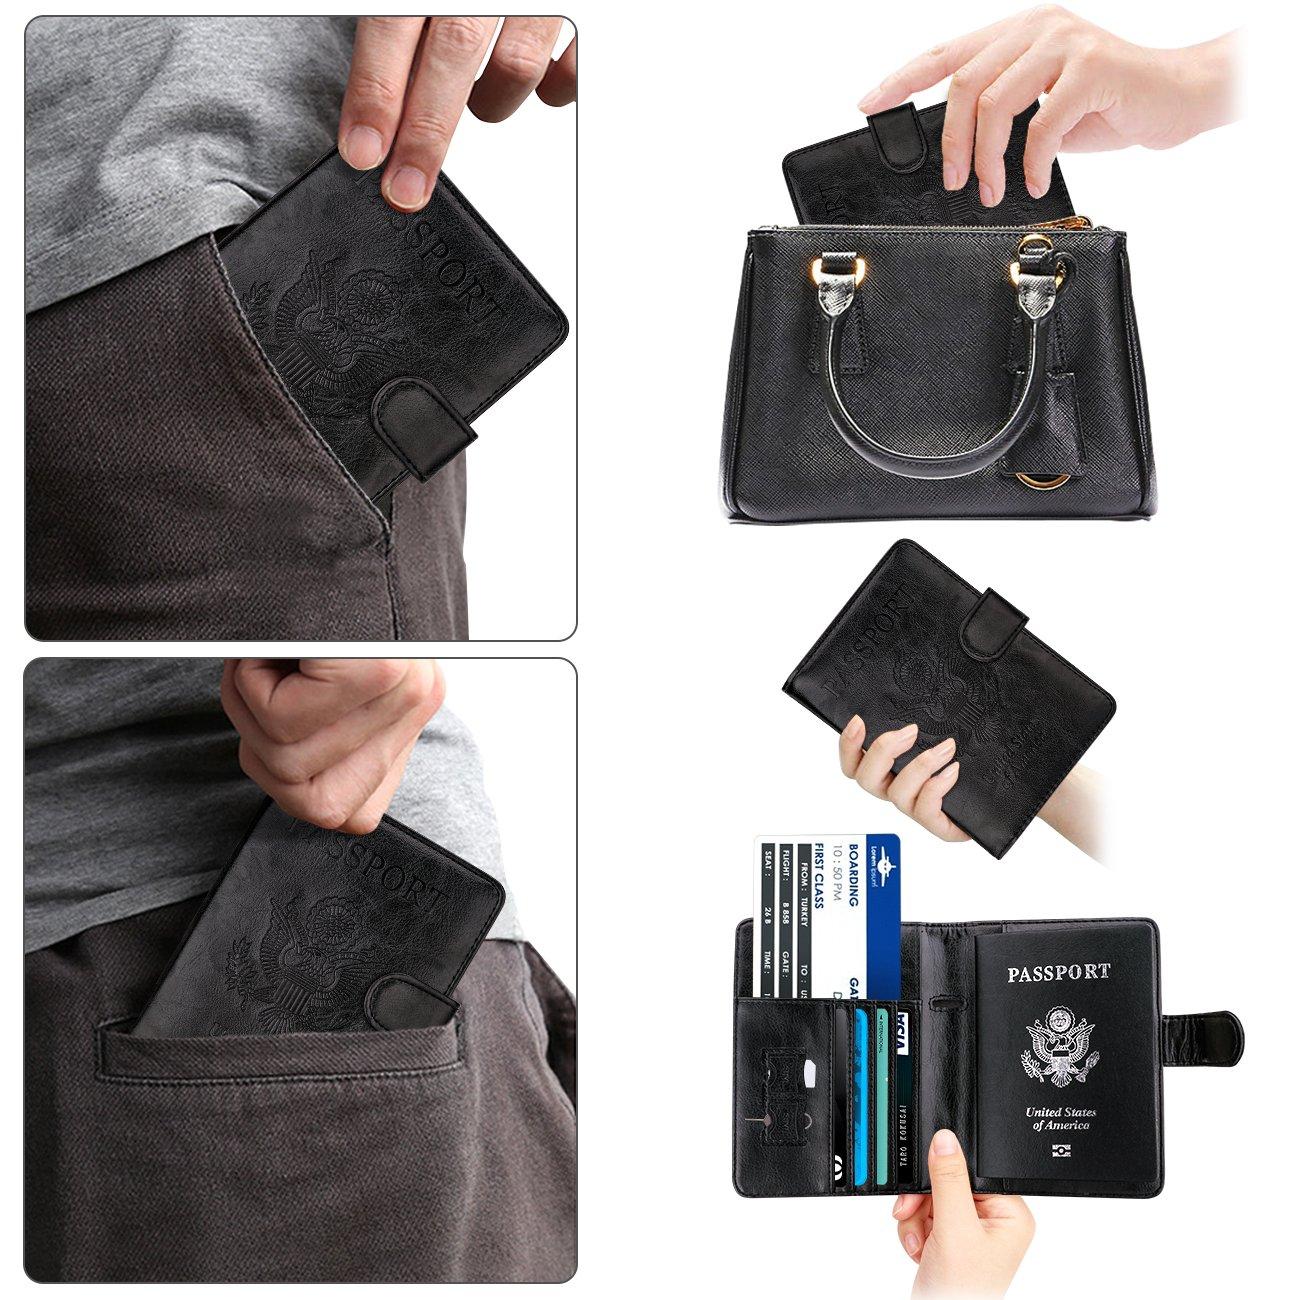 WALNEW Passport Holder Cover Case RFID Passport Travel Wallet,Gray